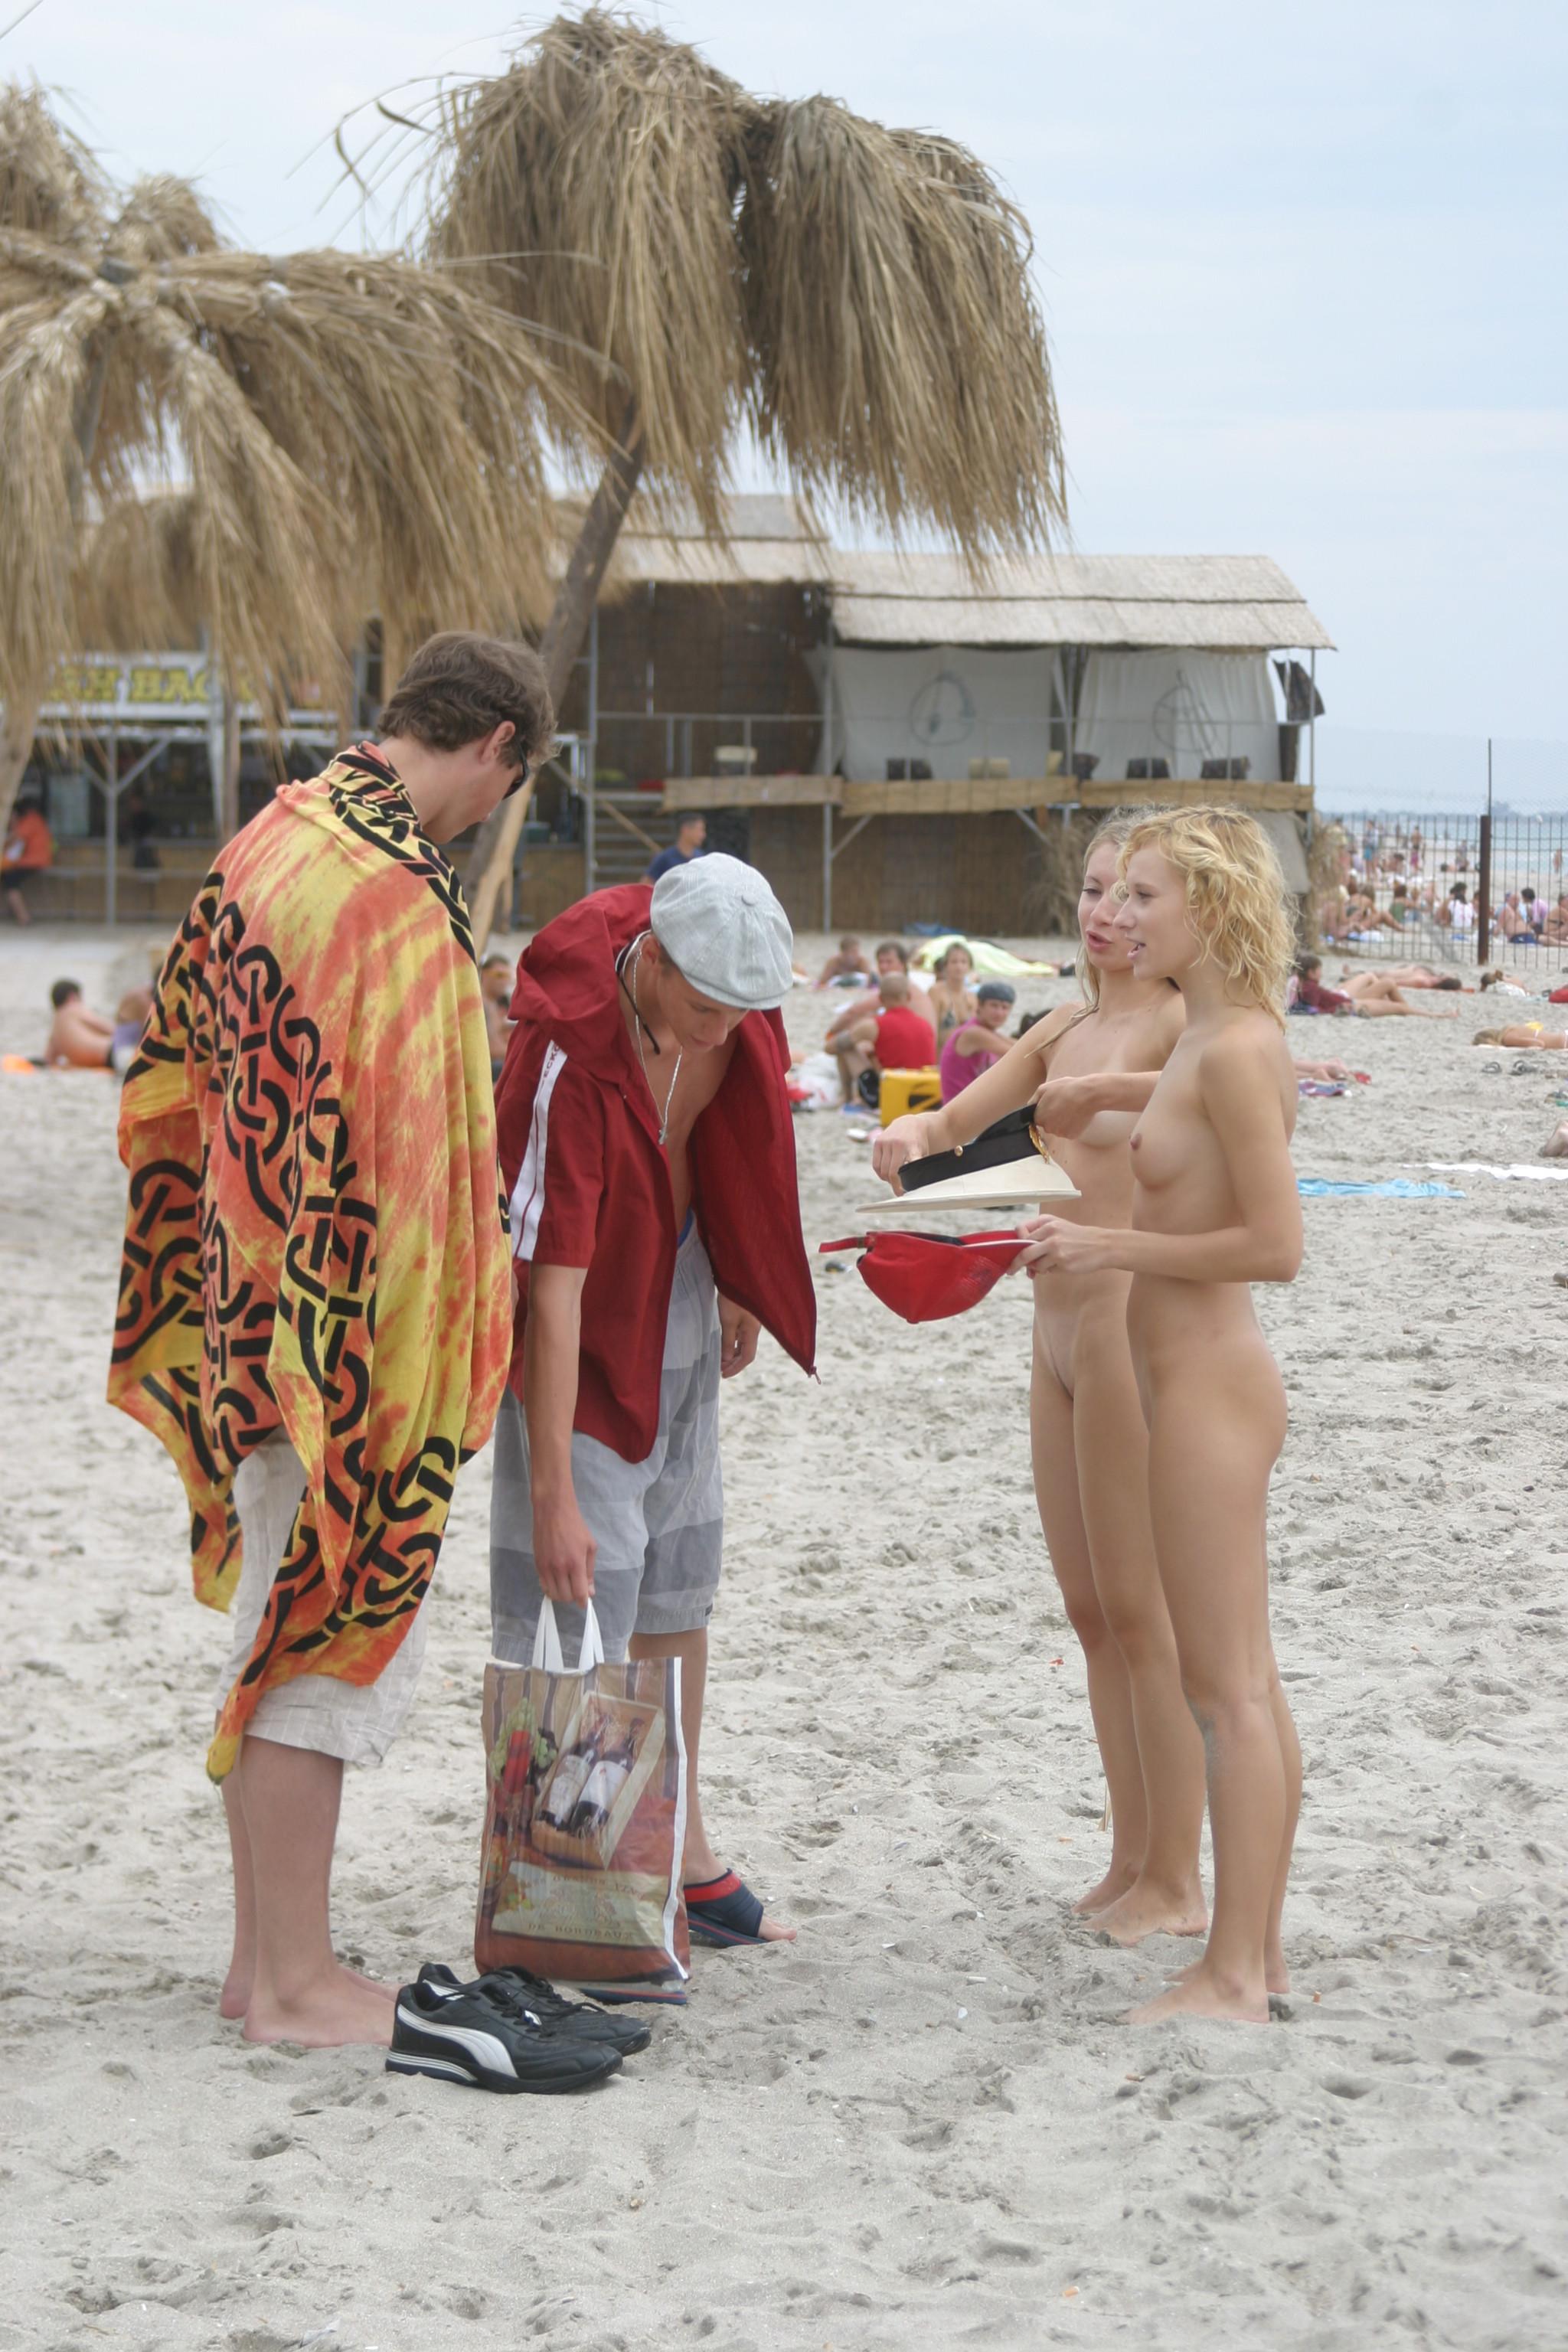 vika-y-lena-l-beach-nude-in-public-metart-29